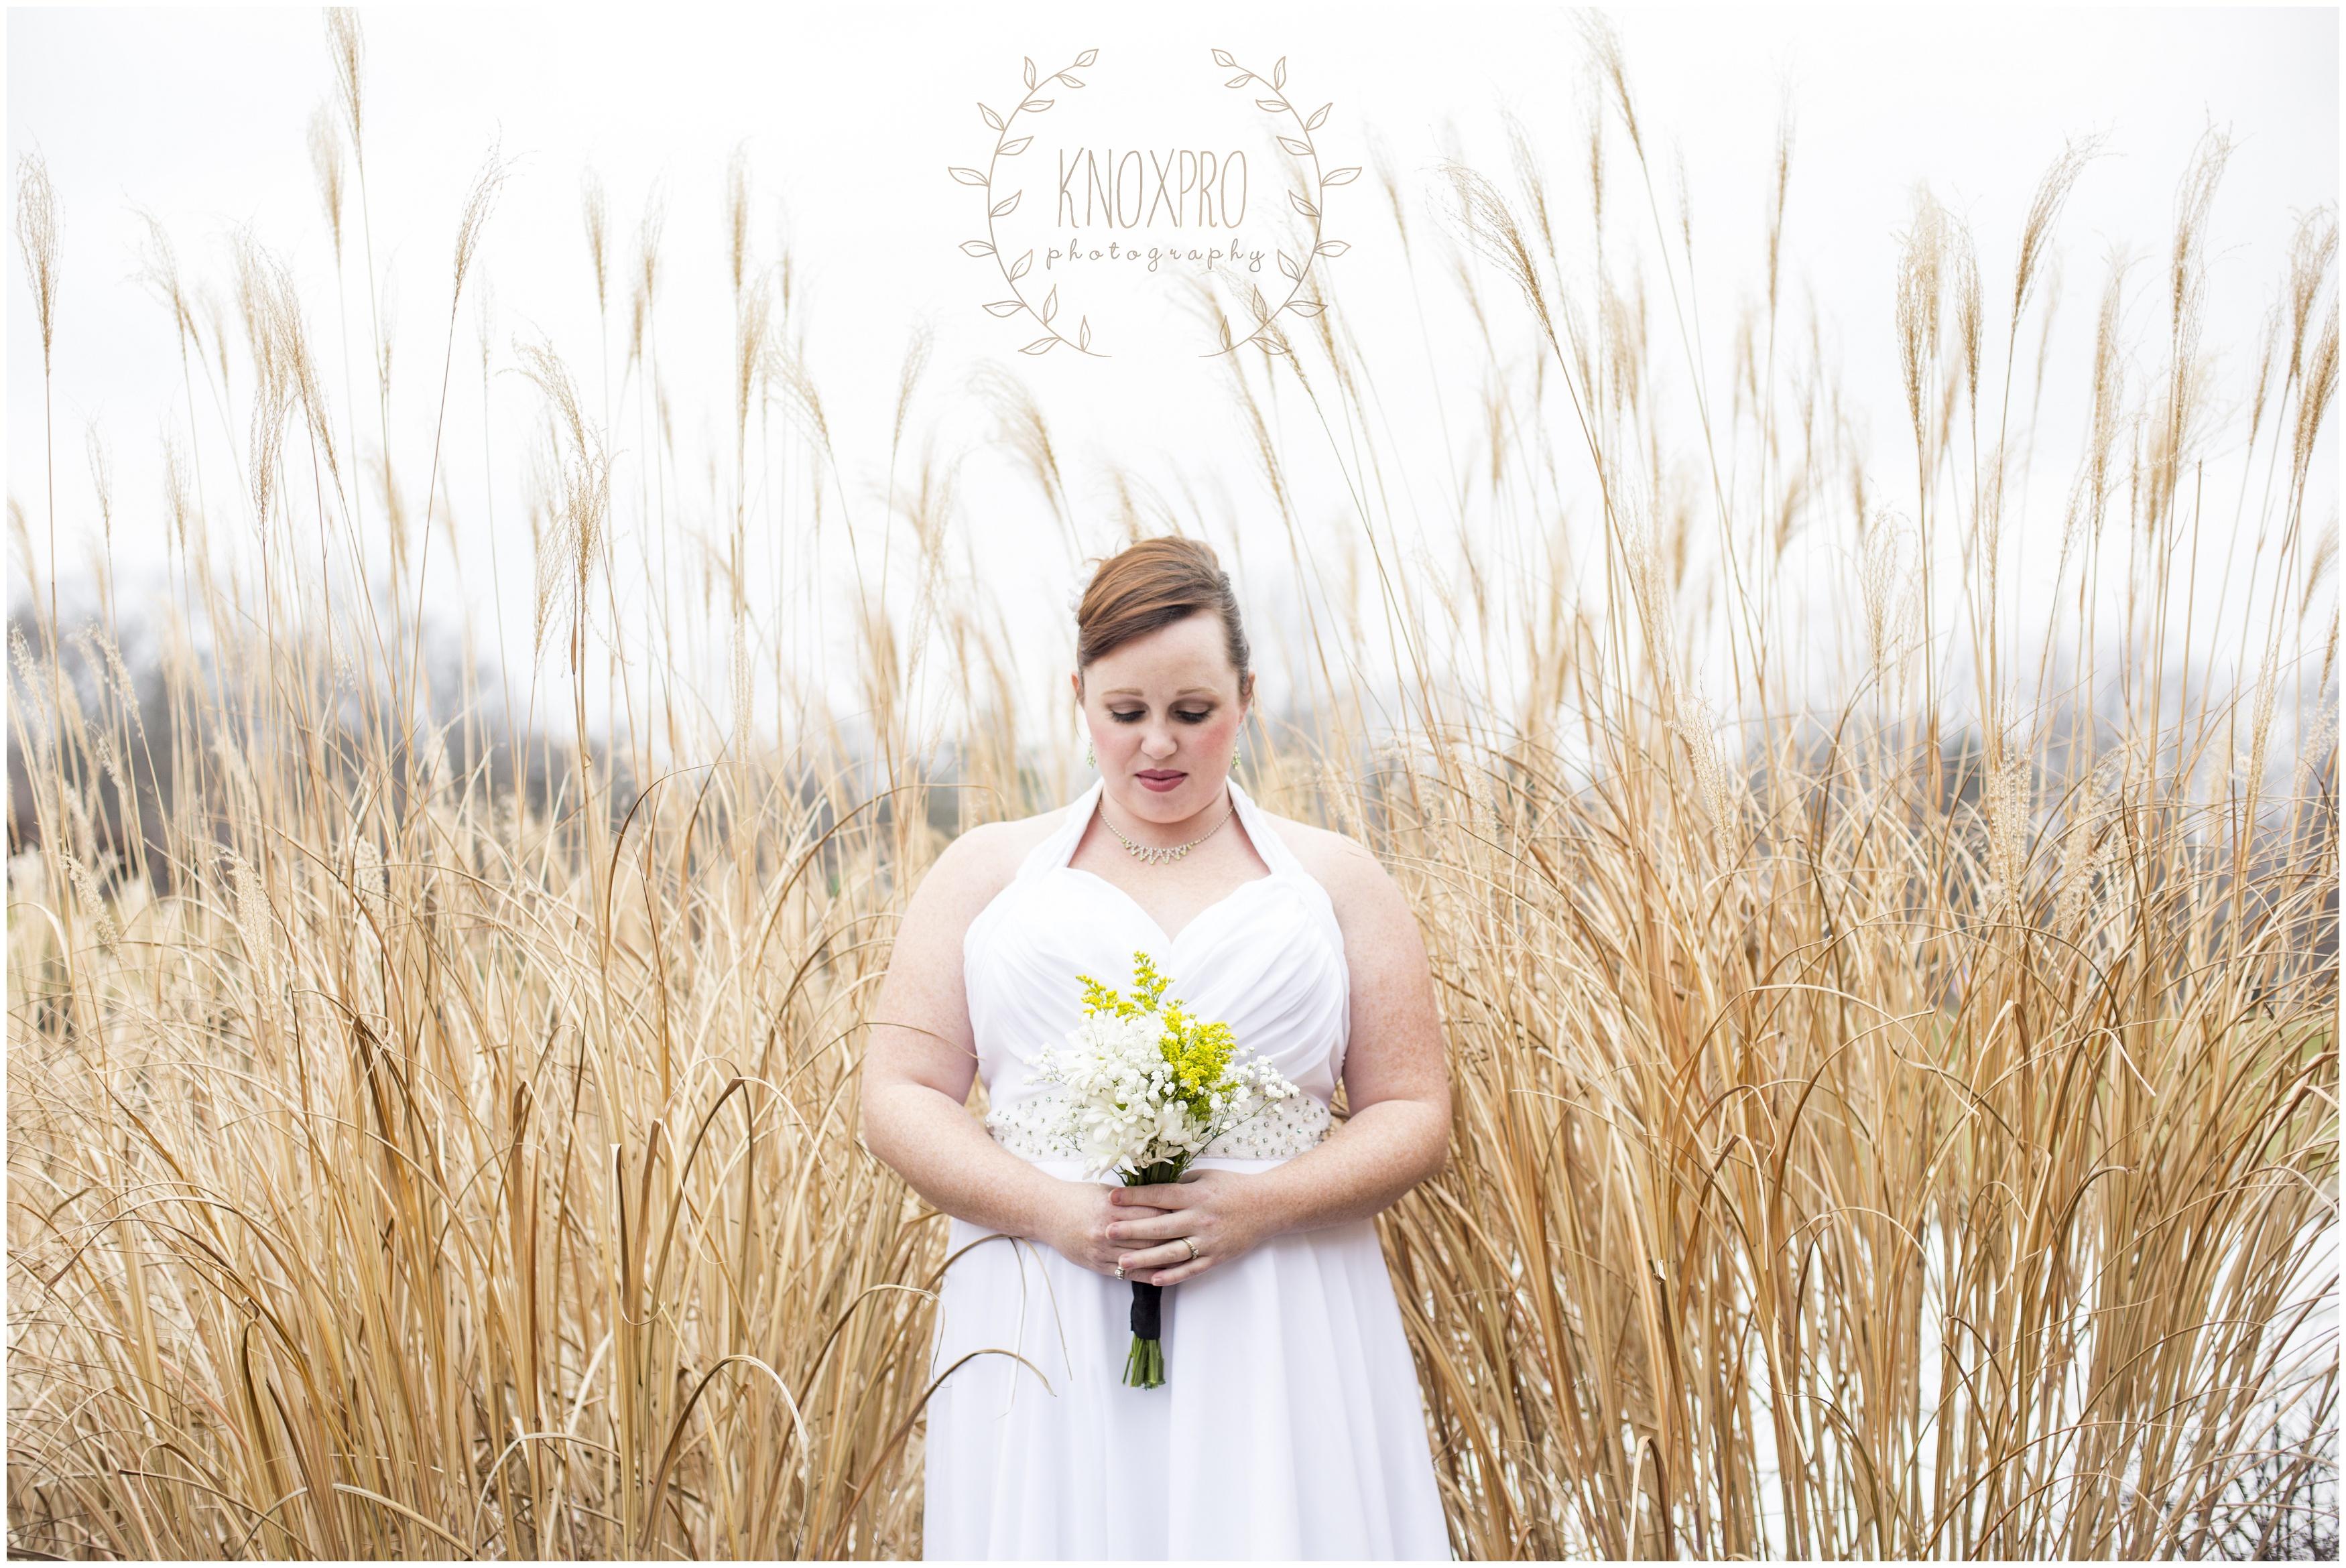 knox pro photography cincinnati wedding photographers photographer photography photo